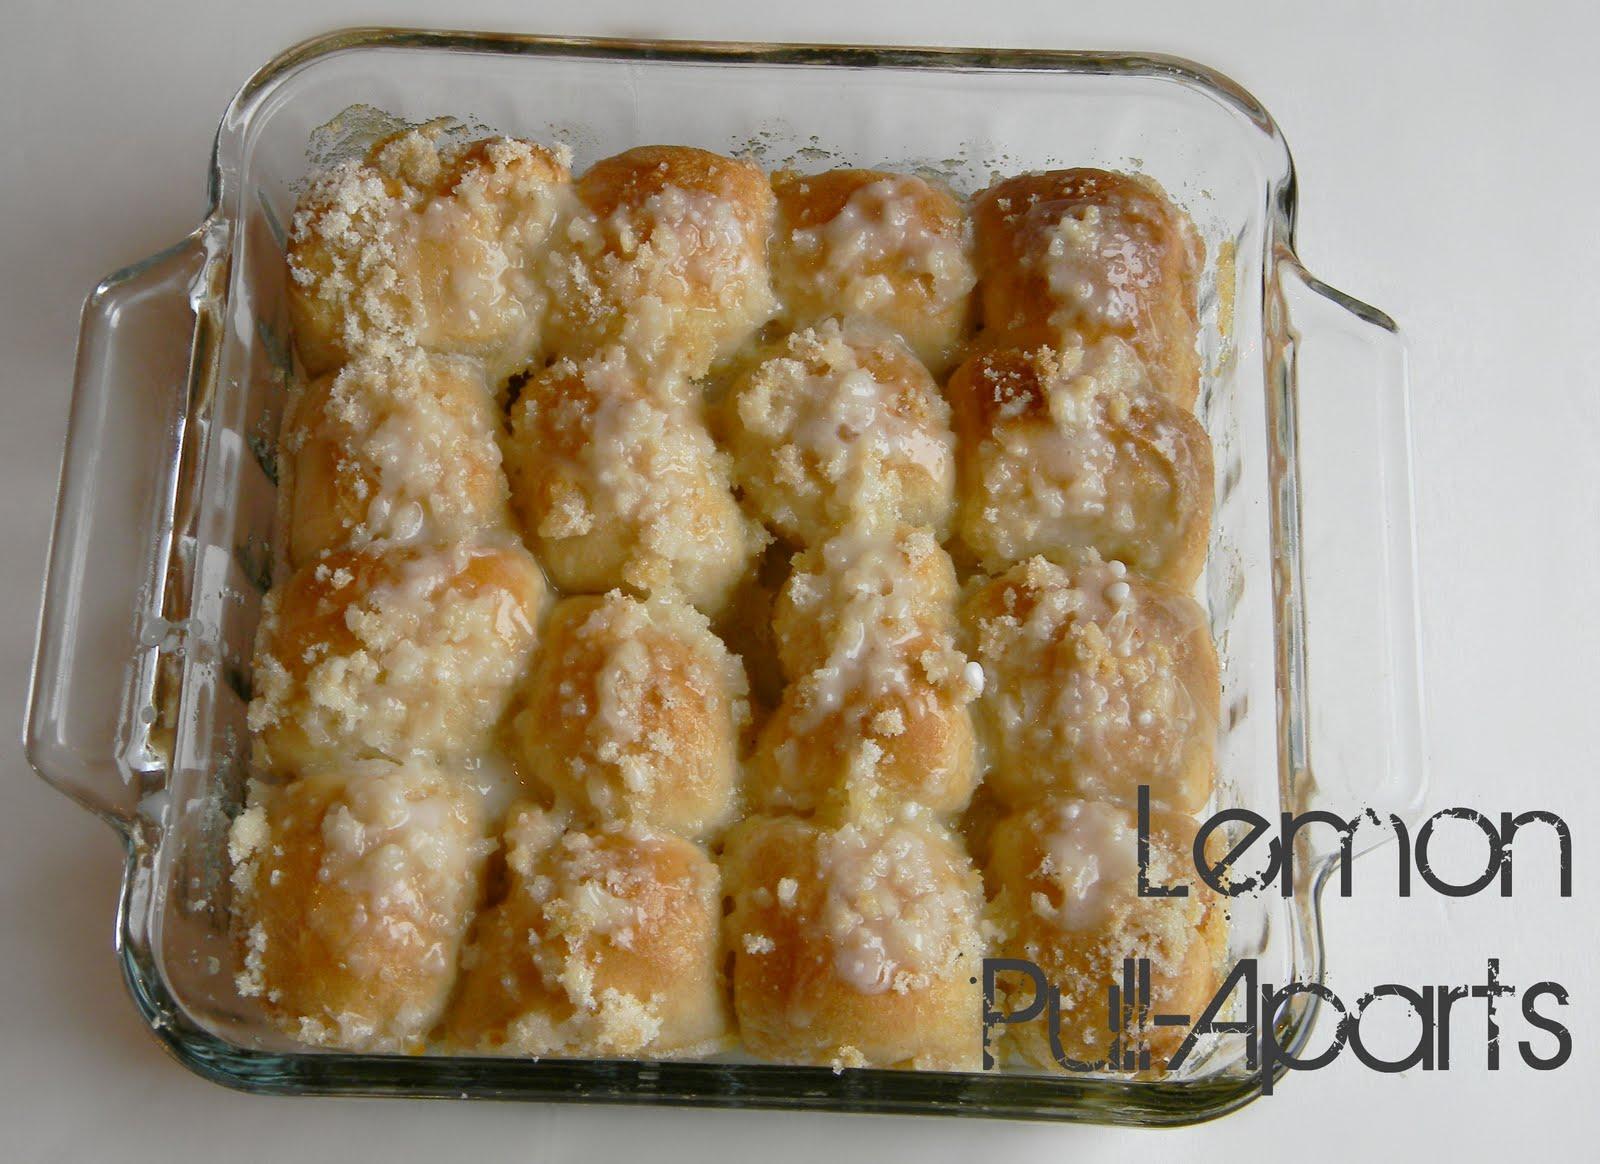 Mini Lemon Drizzle Loaf Cakes